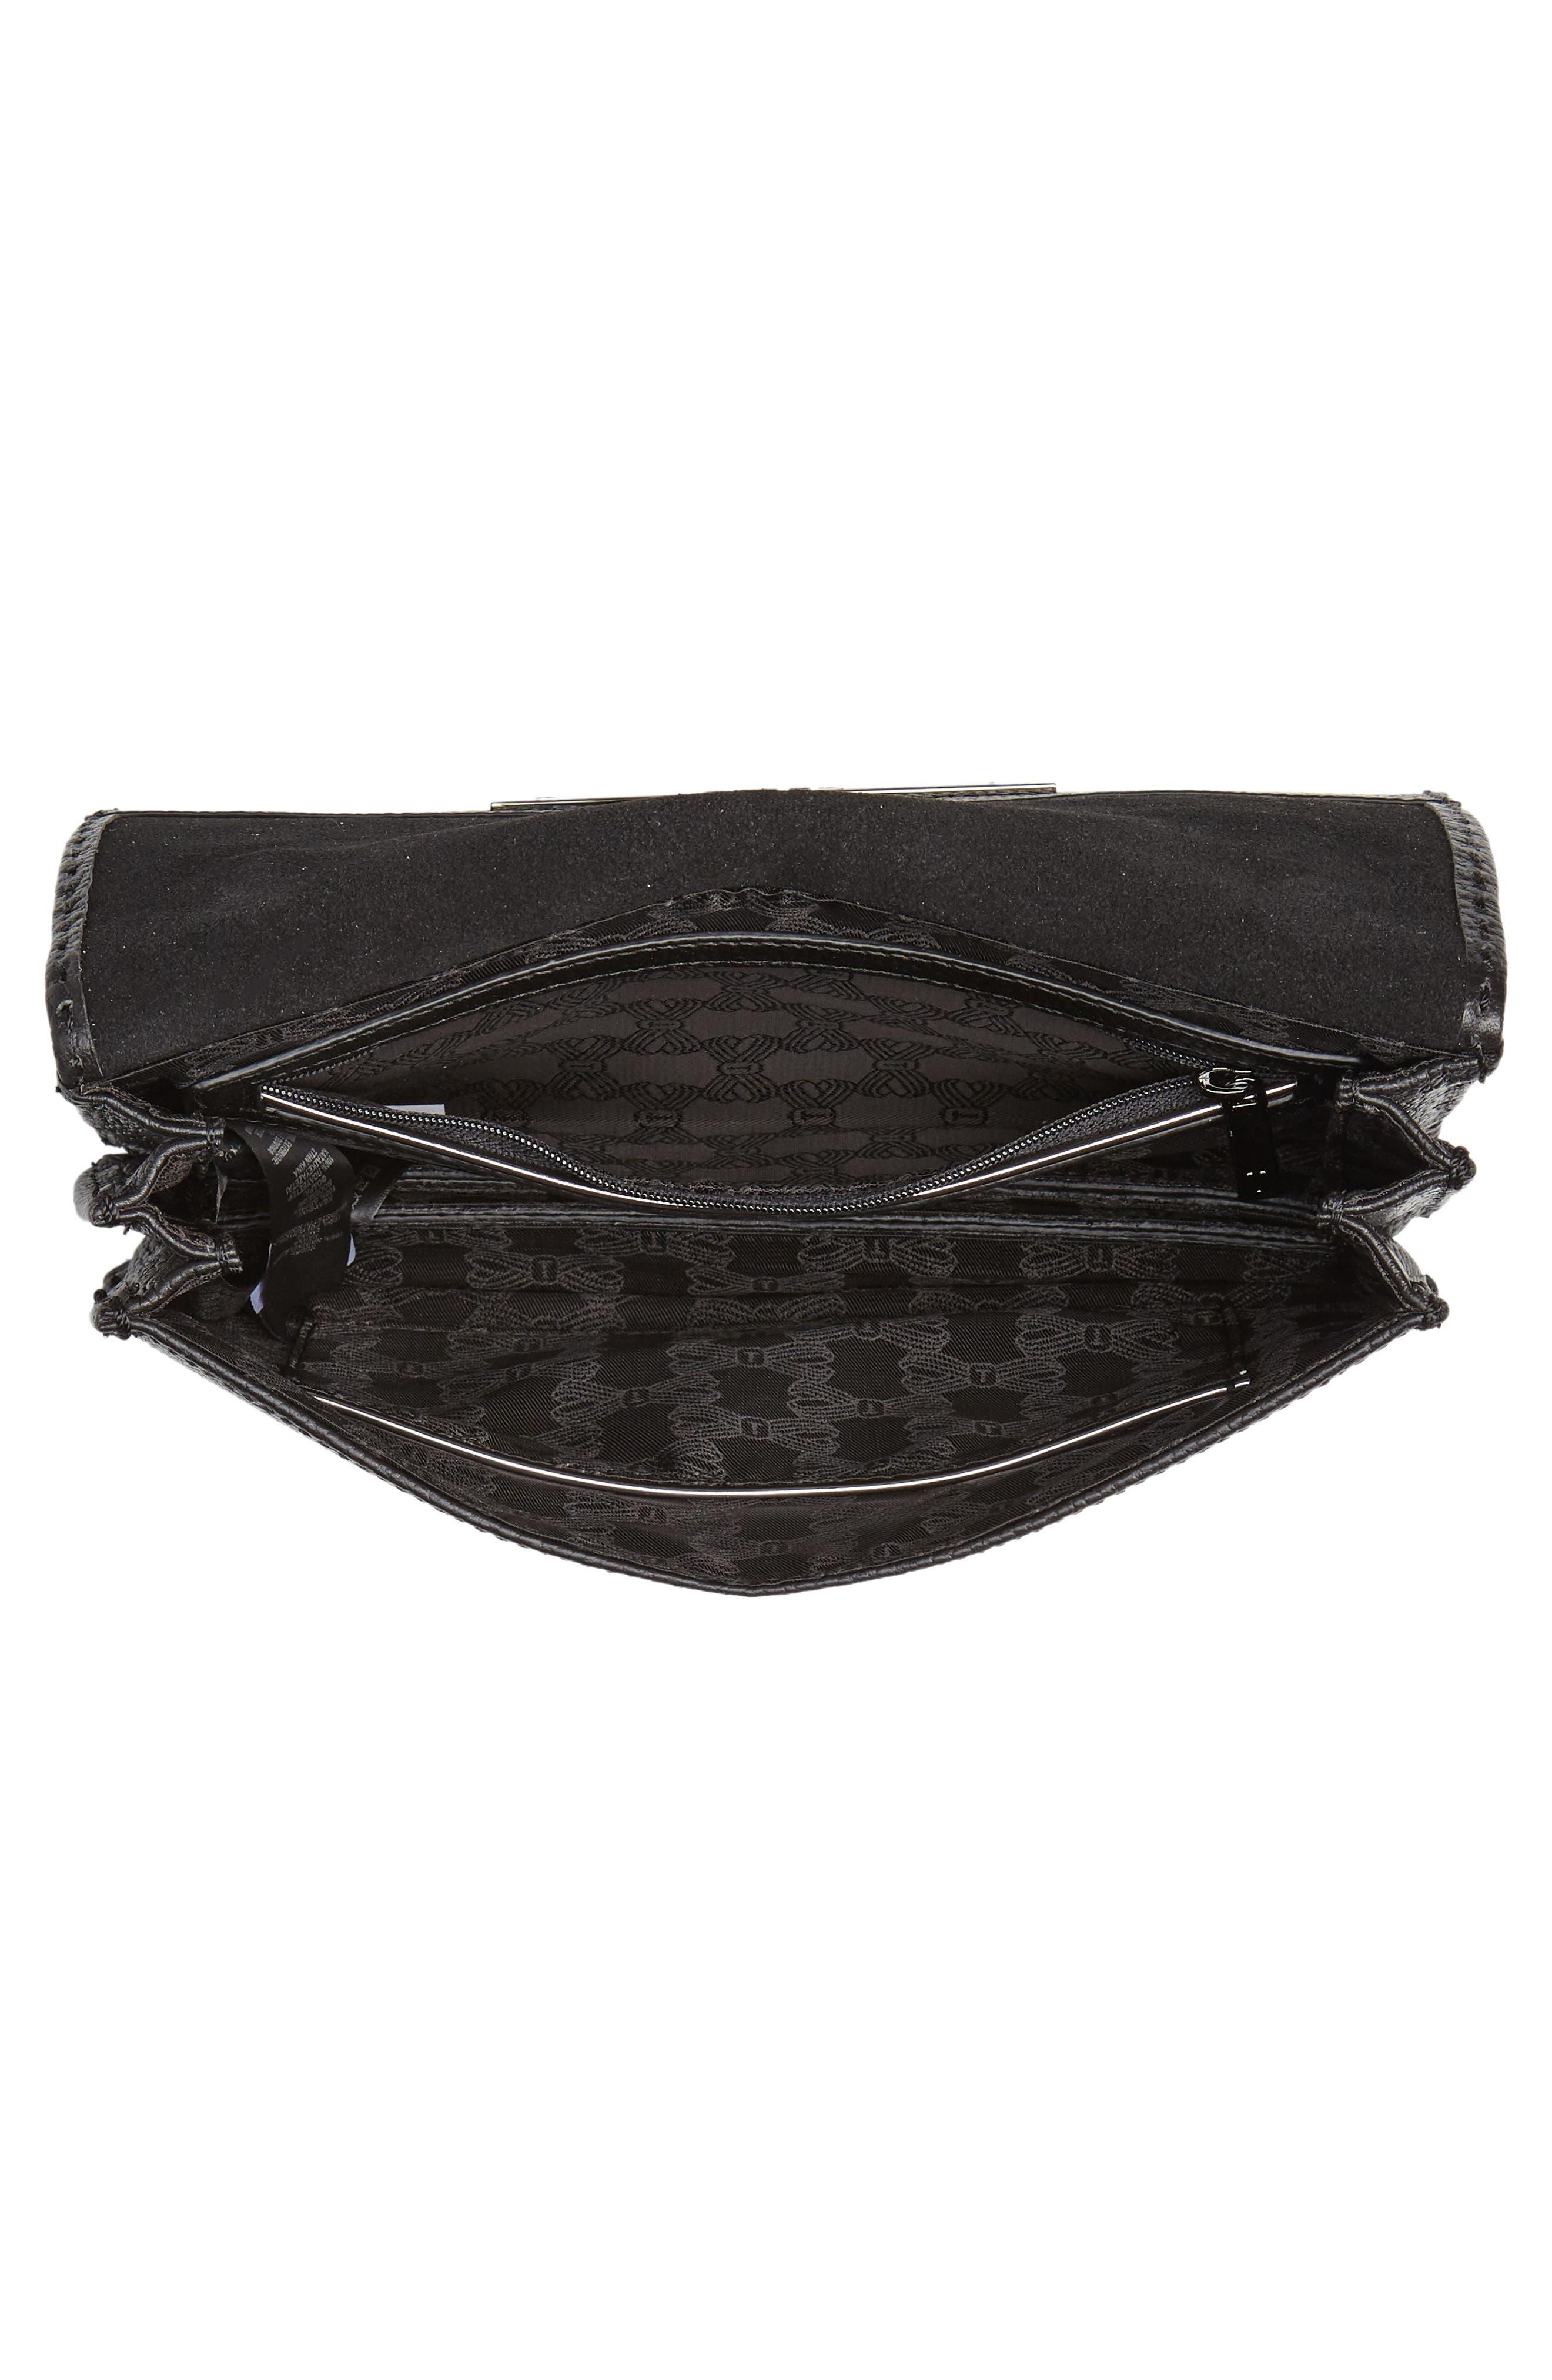 TED BAKER LONDON,                             Jocie Leather Crossbody Bag,                             Alternate thumbnail 4, color,                             001